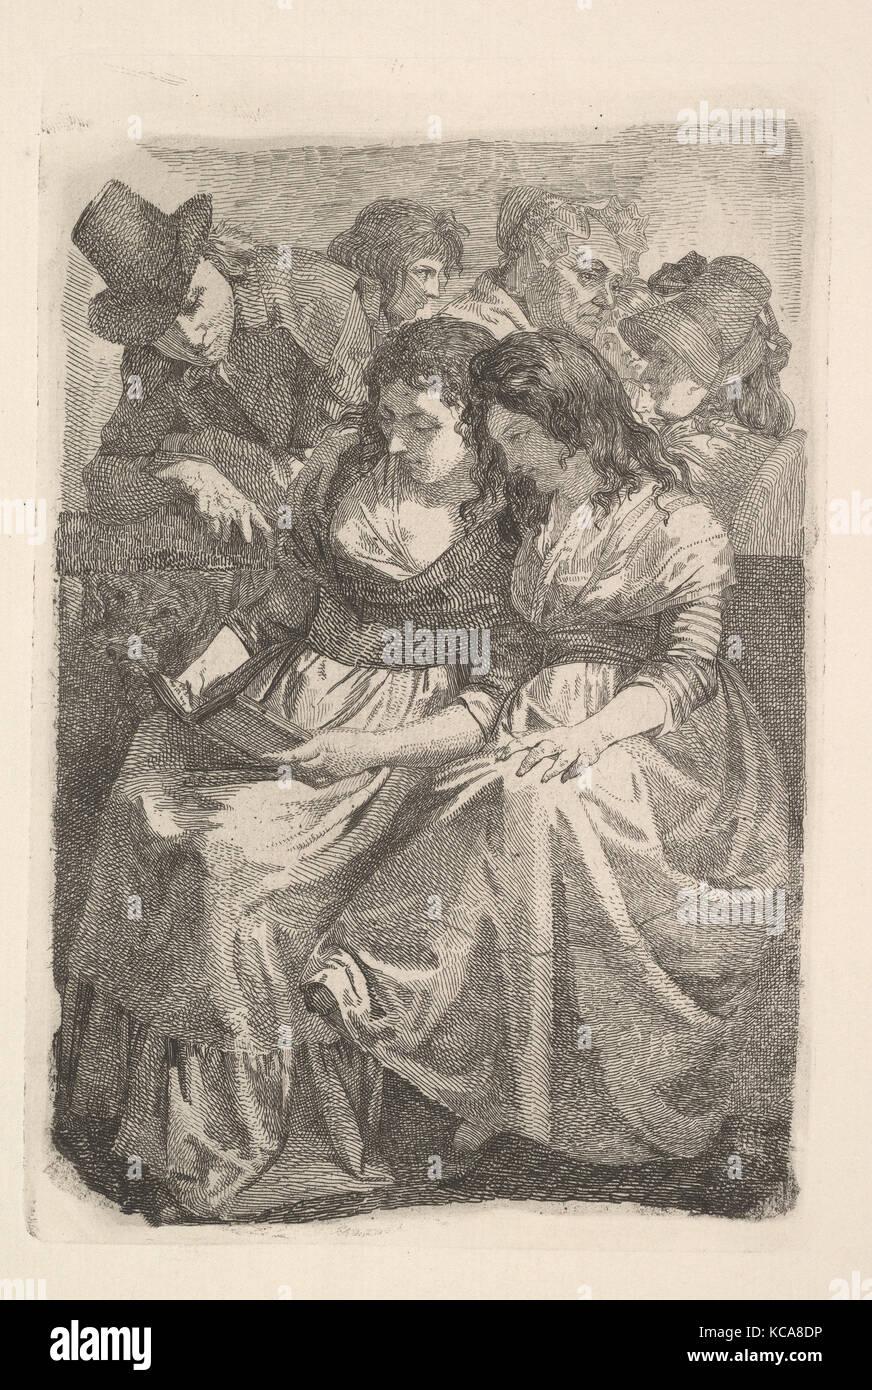 Schadow y su familia, Johann Gottfried Schadow, 1925 Foto de stock